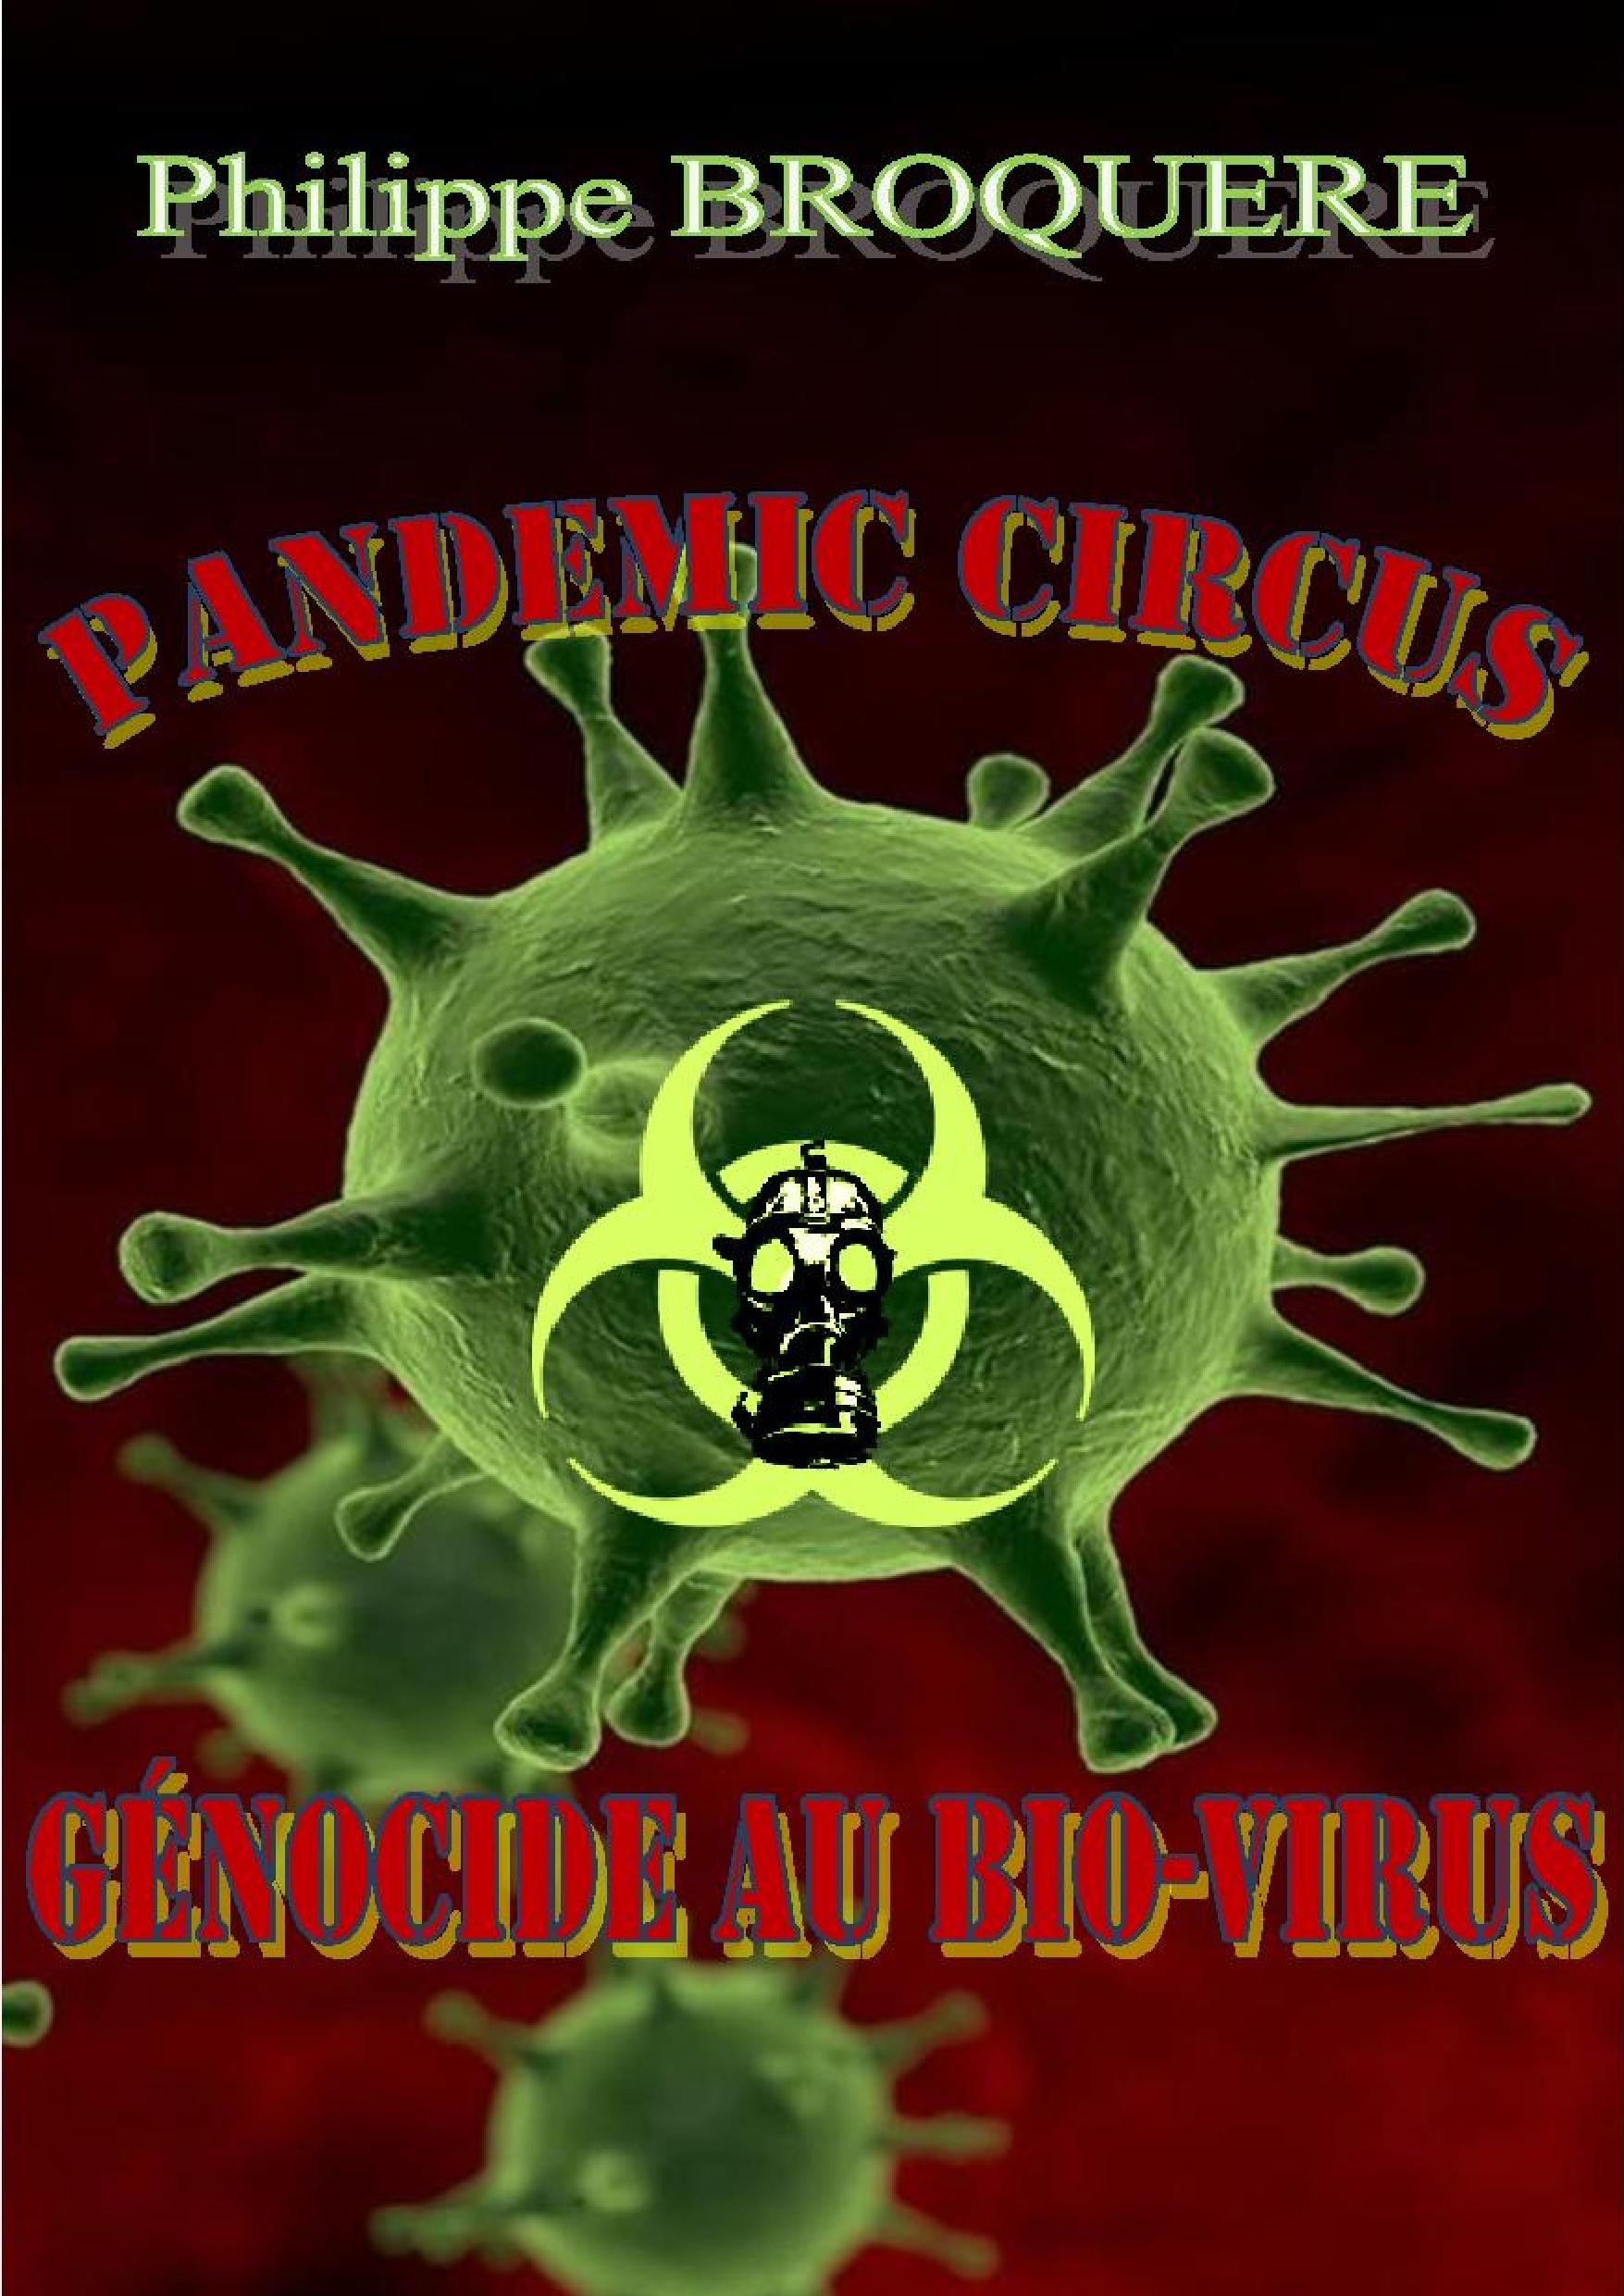 Pandemic Circus Génocide au bio-virus